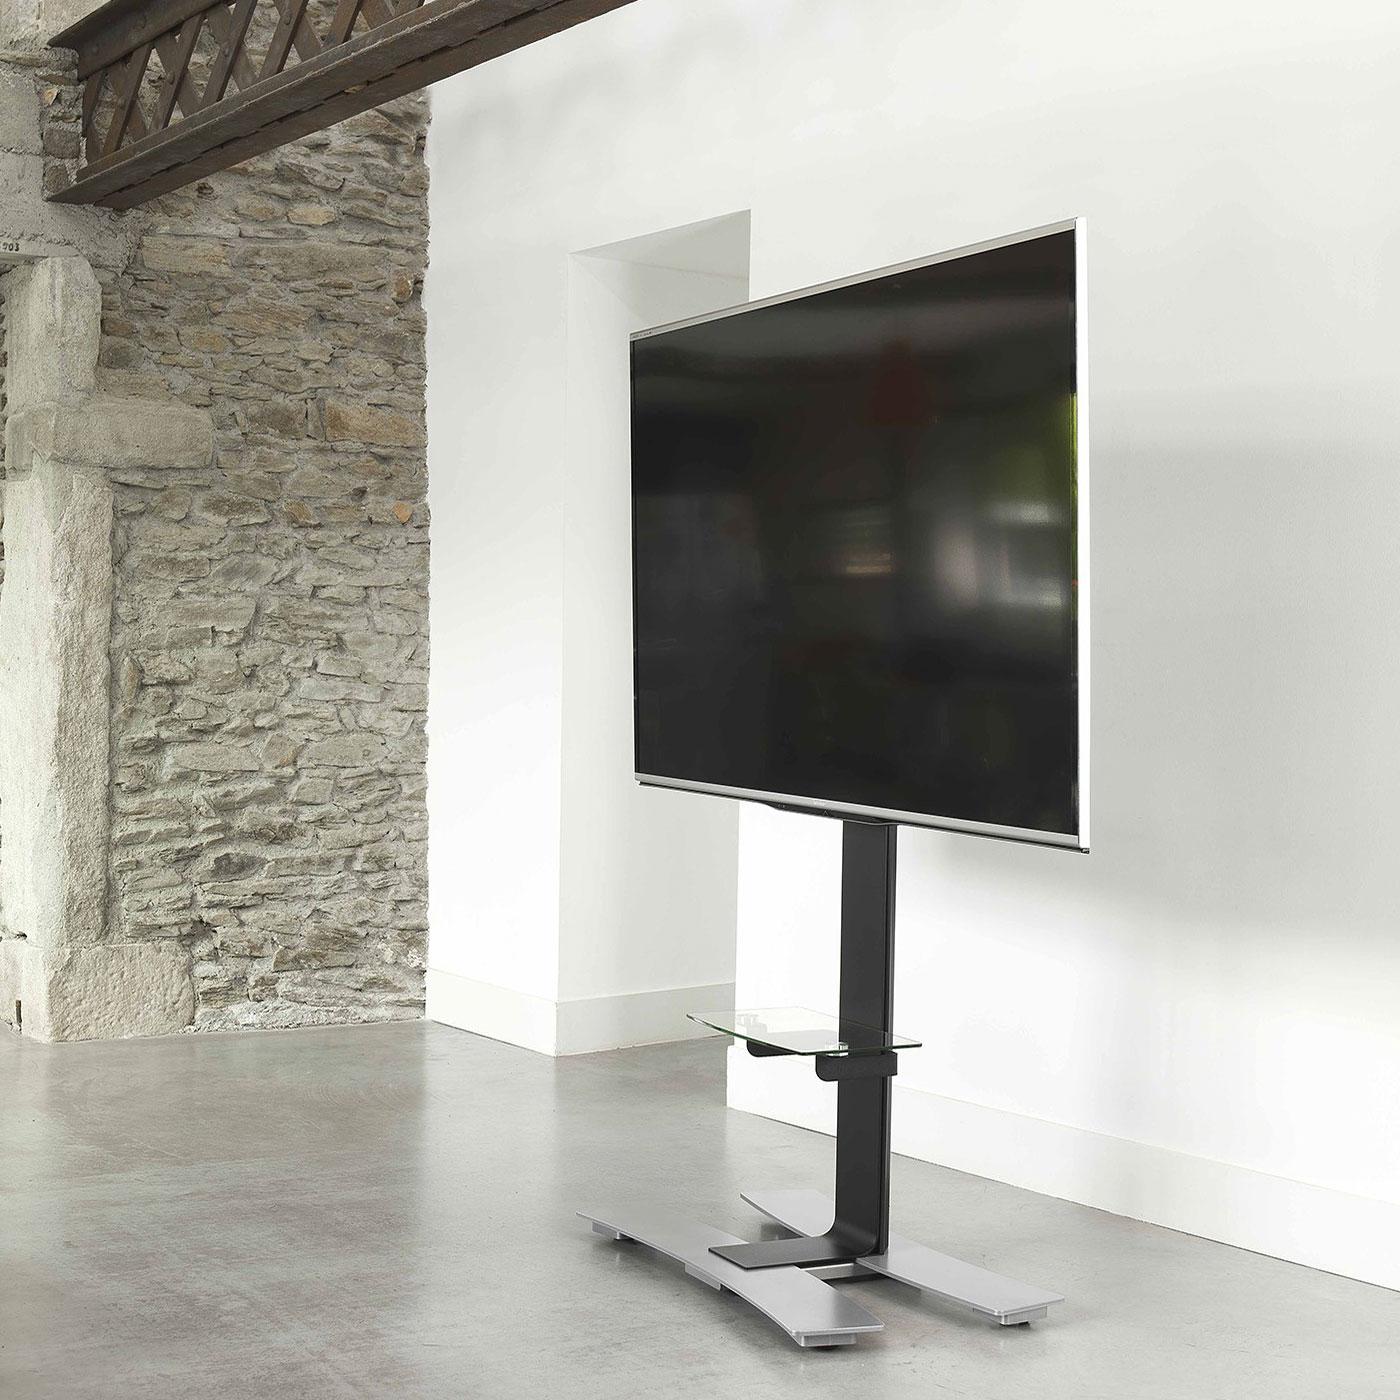 erard will 1600 xl noir support mural tv erard group sur. Black Bedroom Furniture Sets. Home Design Ideas